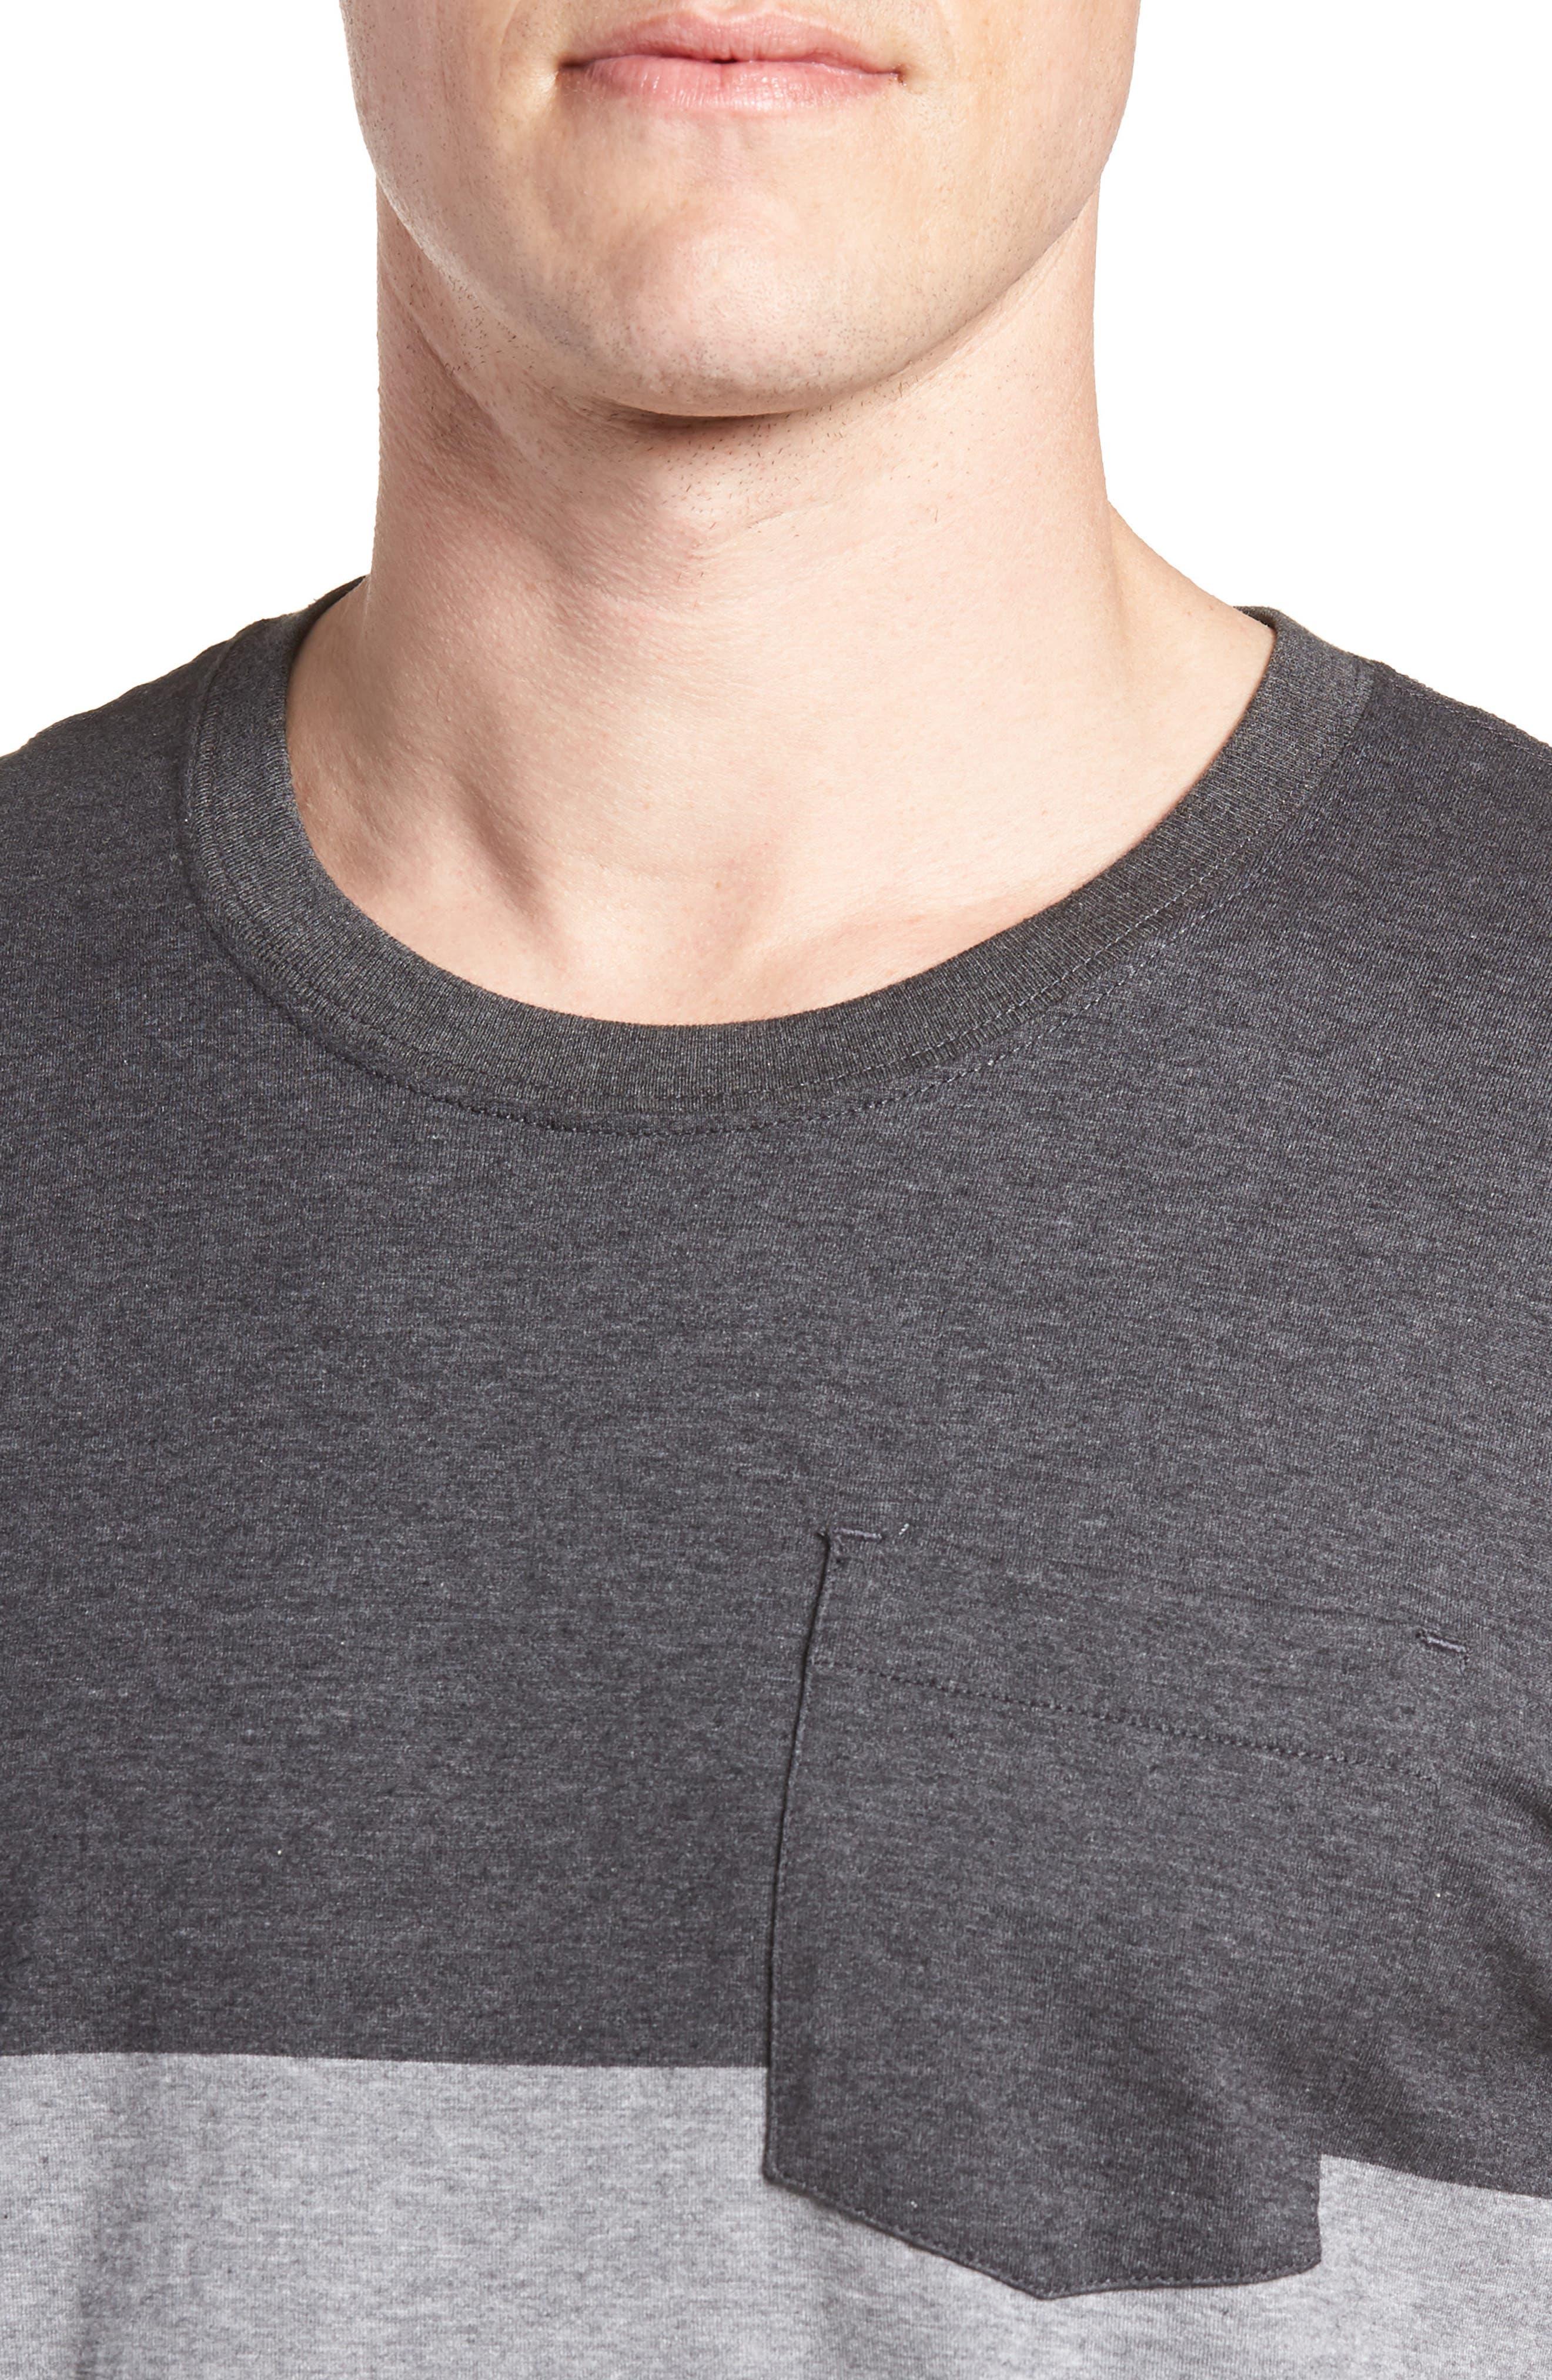 Kramp Colorblock Pocket T-Shirt,                             Alternate thumbnail 4, color,